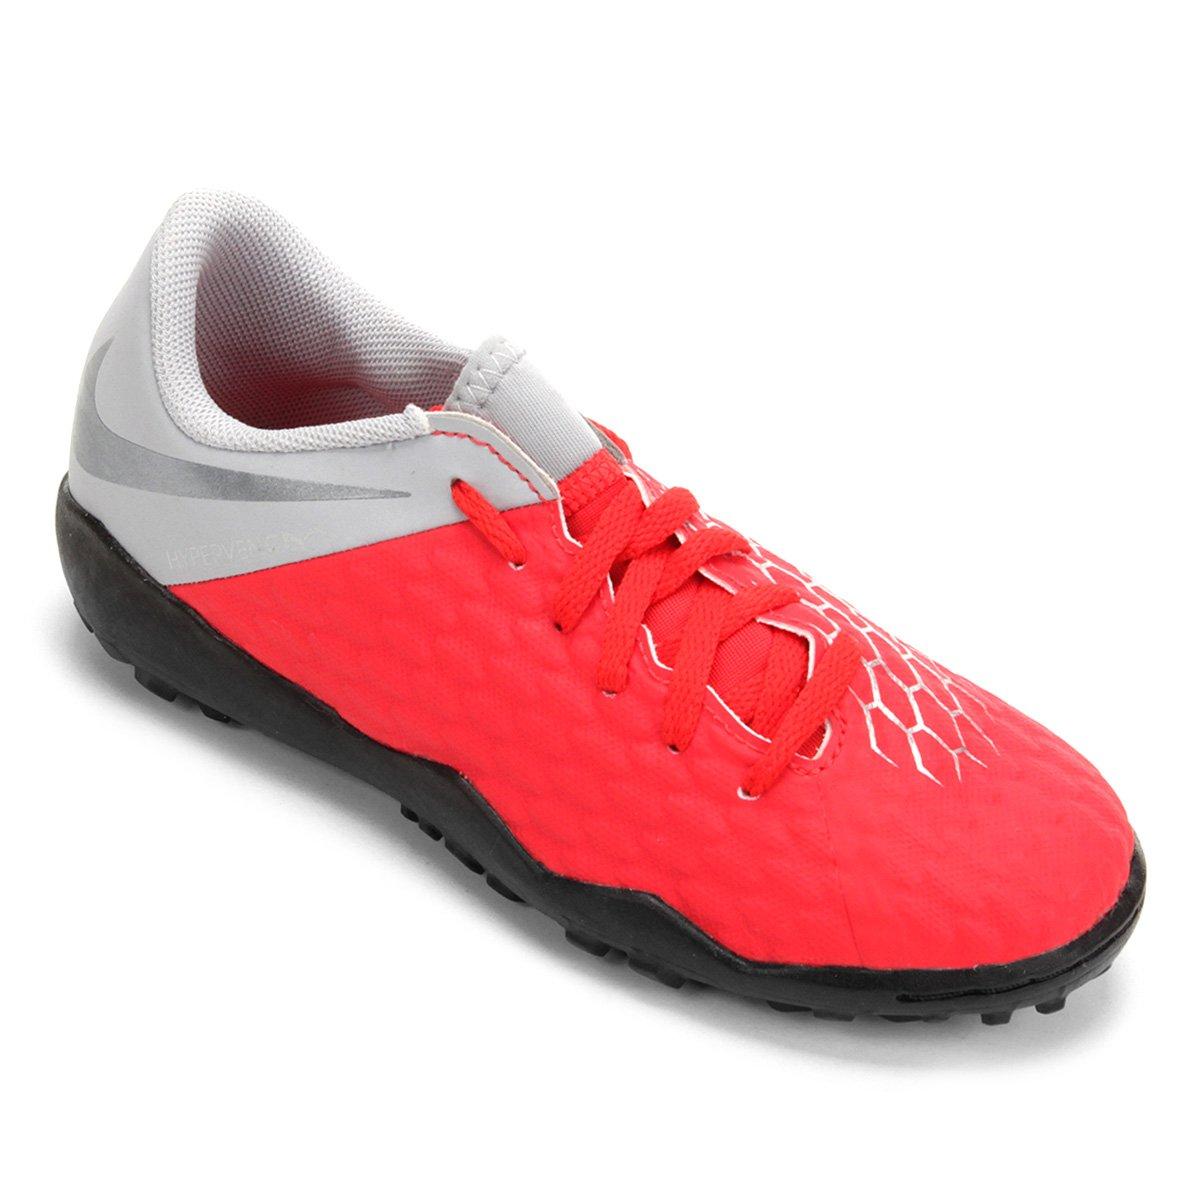 Chuteira Society Infantil Nike Hypervenom 3 Academy TF - Vermelho e ... b4dd189dbcc21